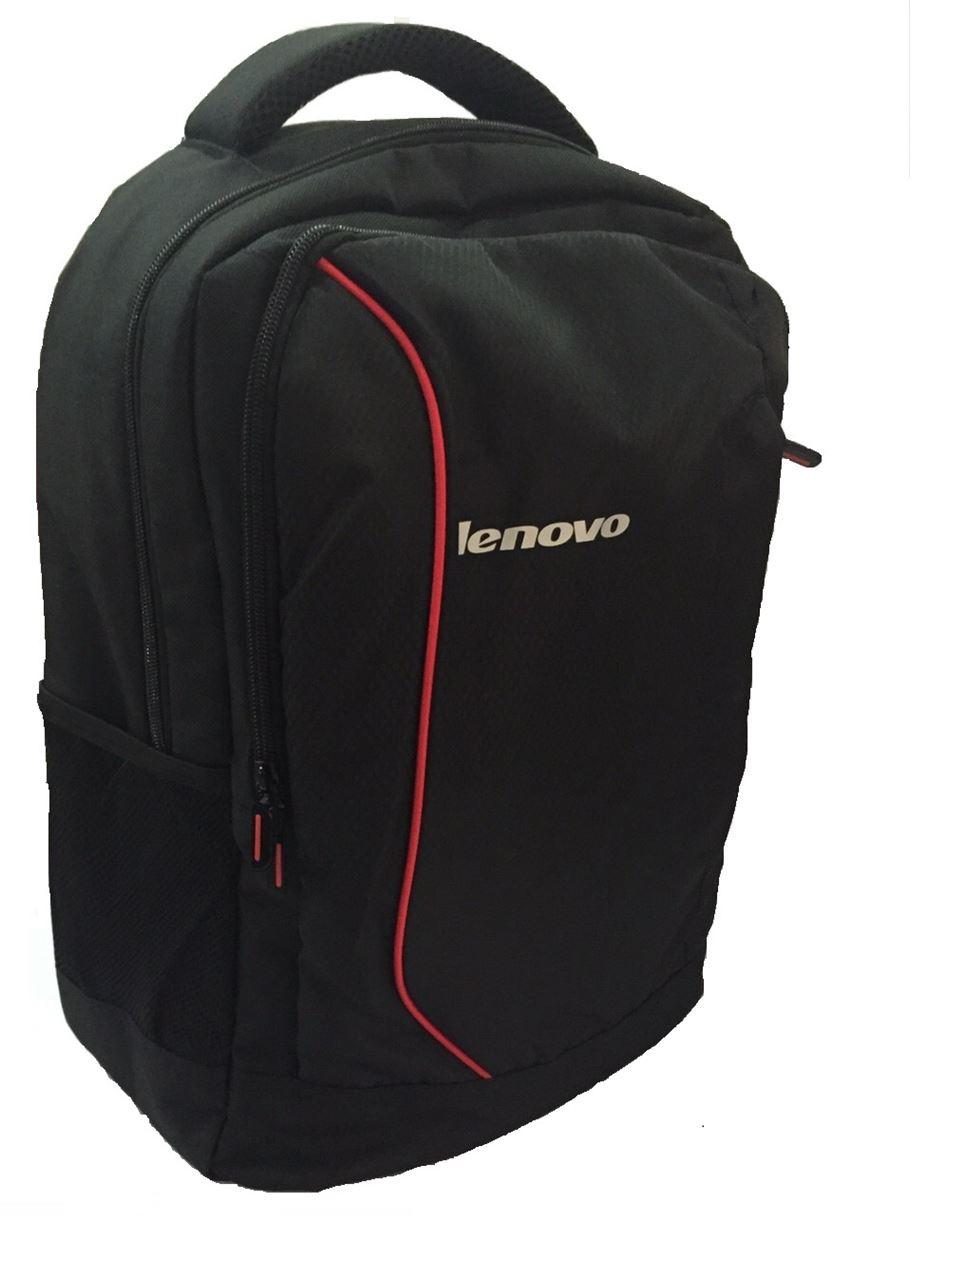 "Lenovo IDEA Lenovo 15.6"" Backpack B3055"